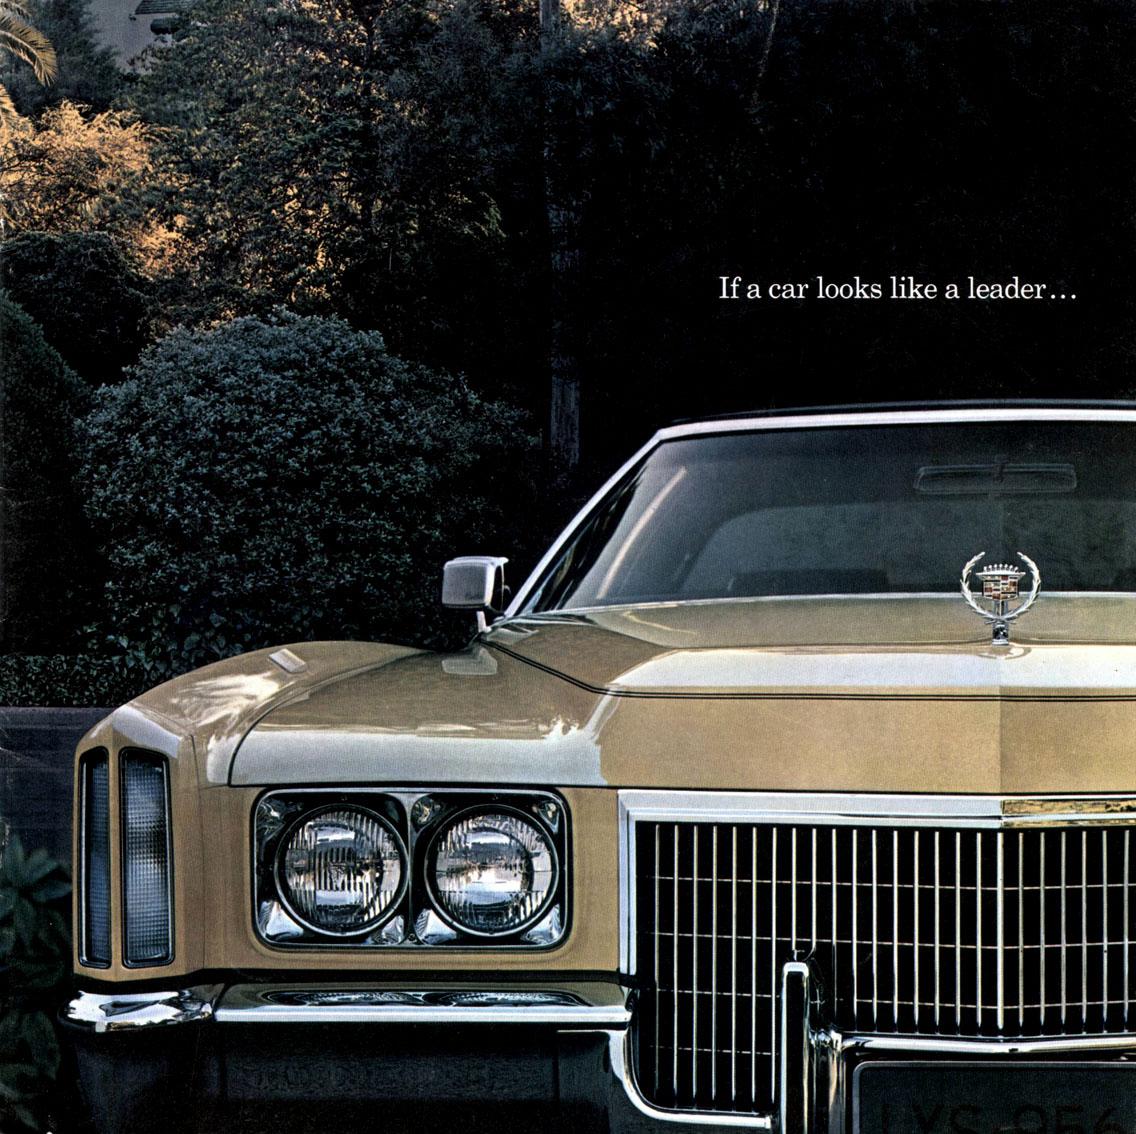 TunnelRam_Cadillac (39).jpg